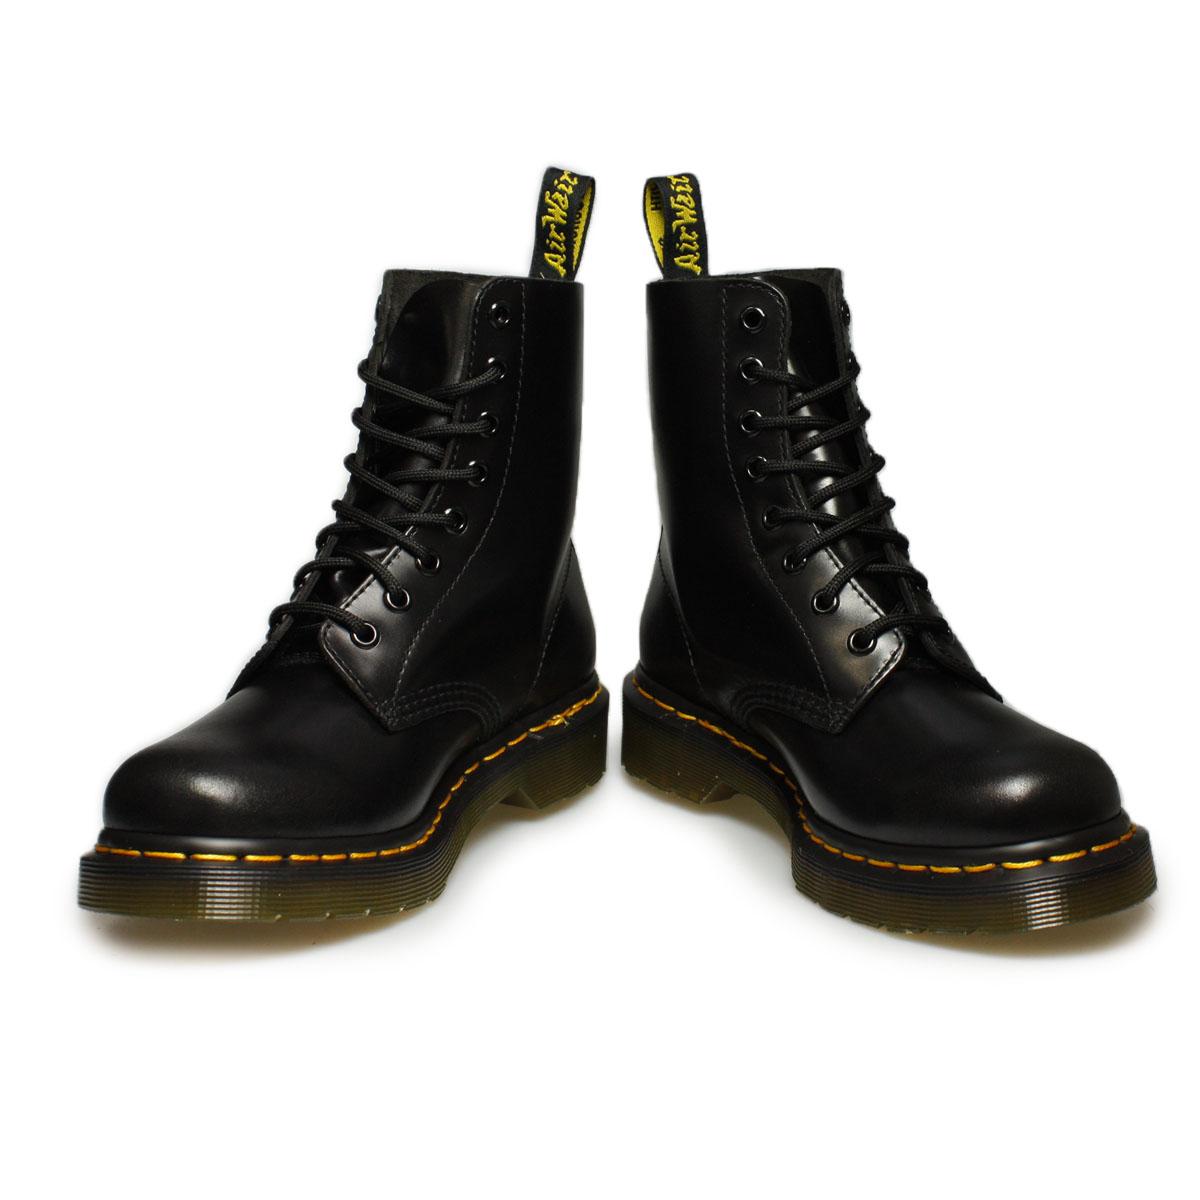 dr martens black pascal buttero boots size 3 8 ebay